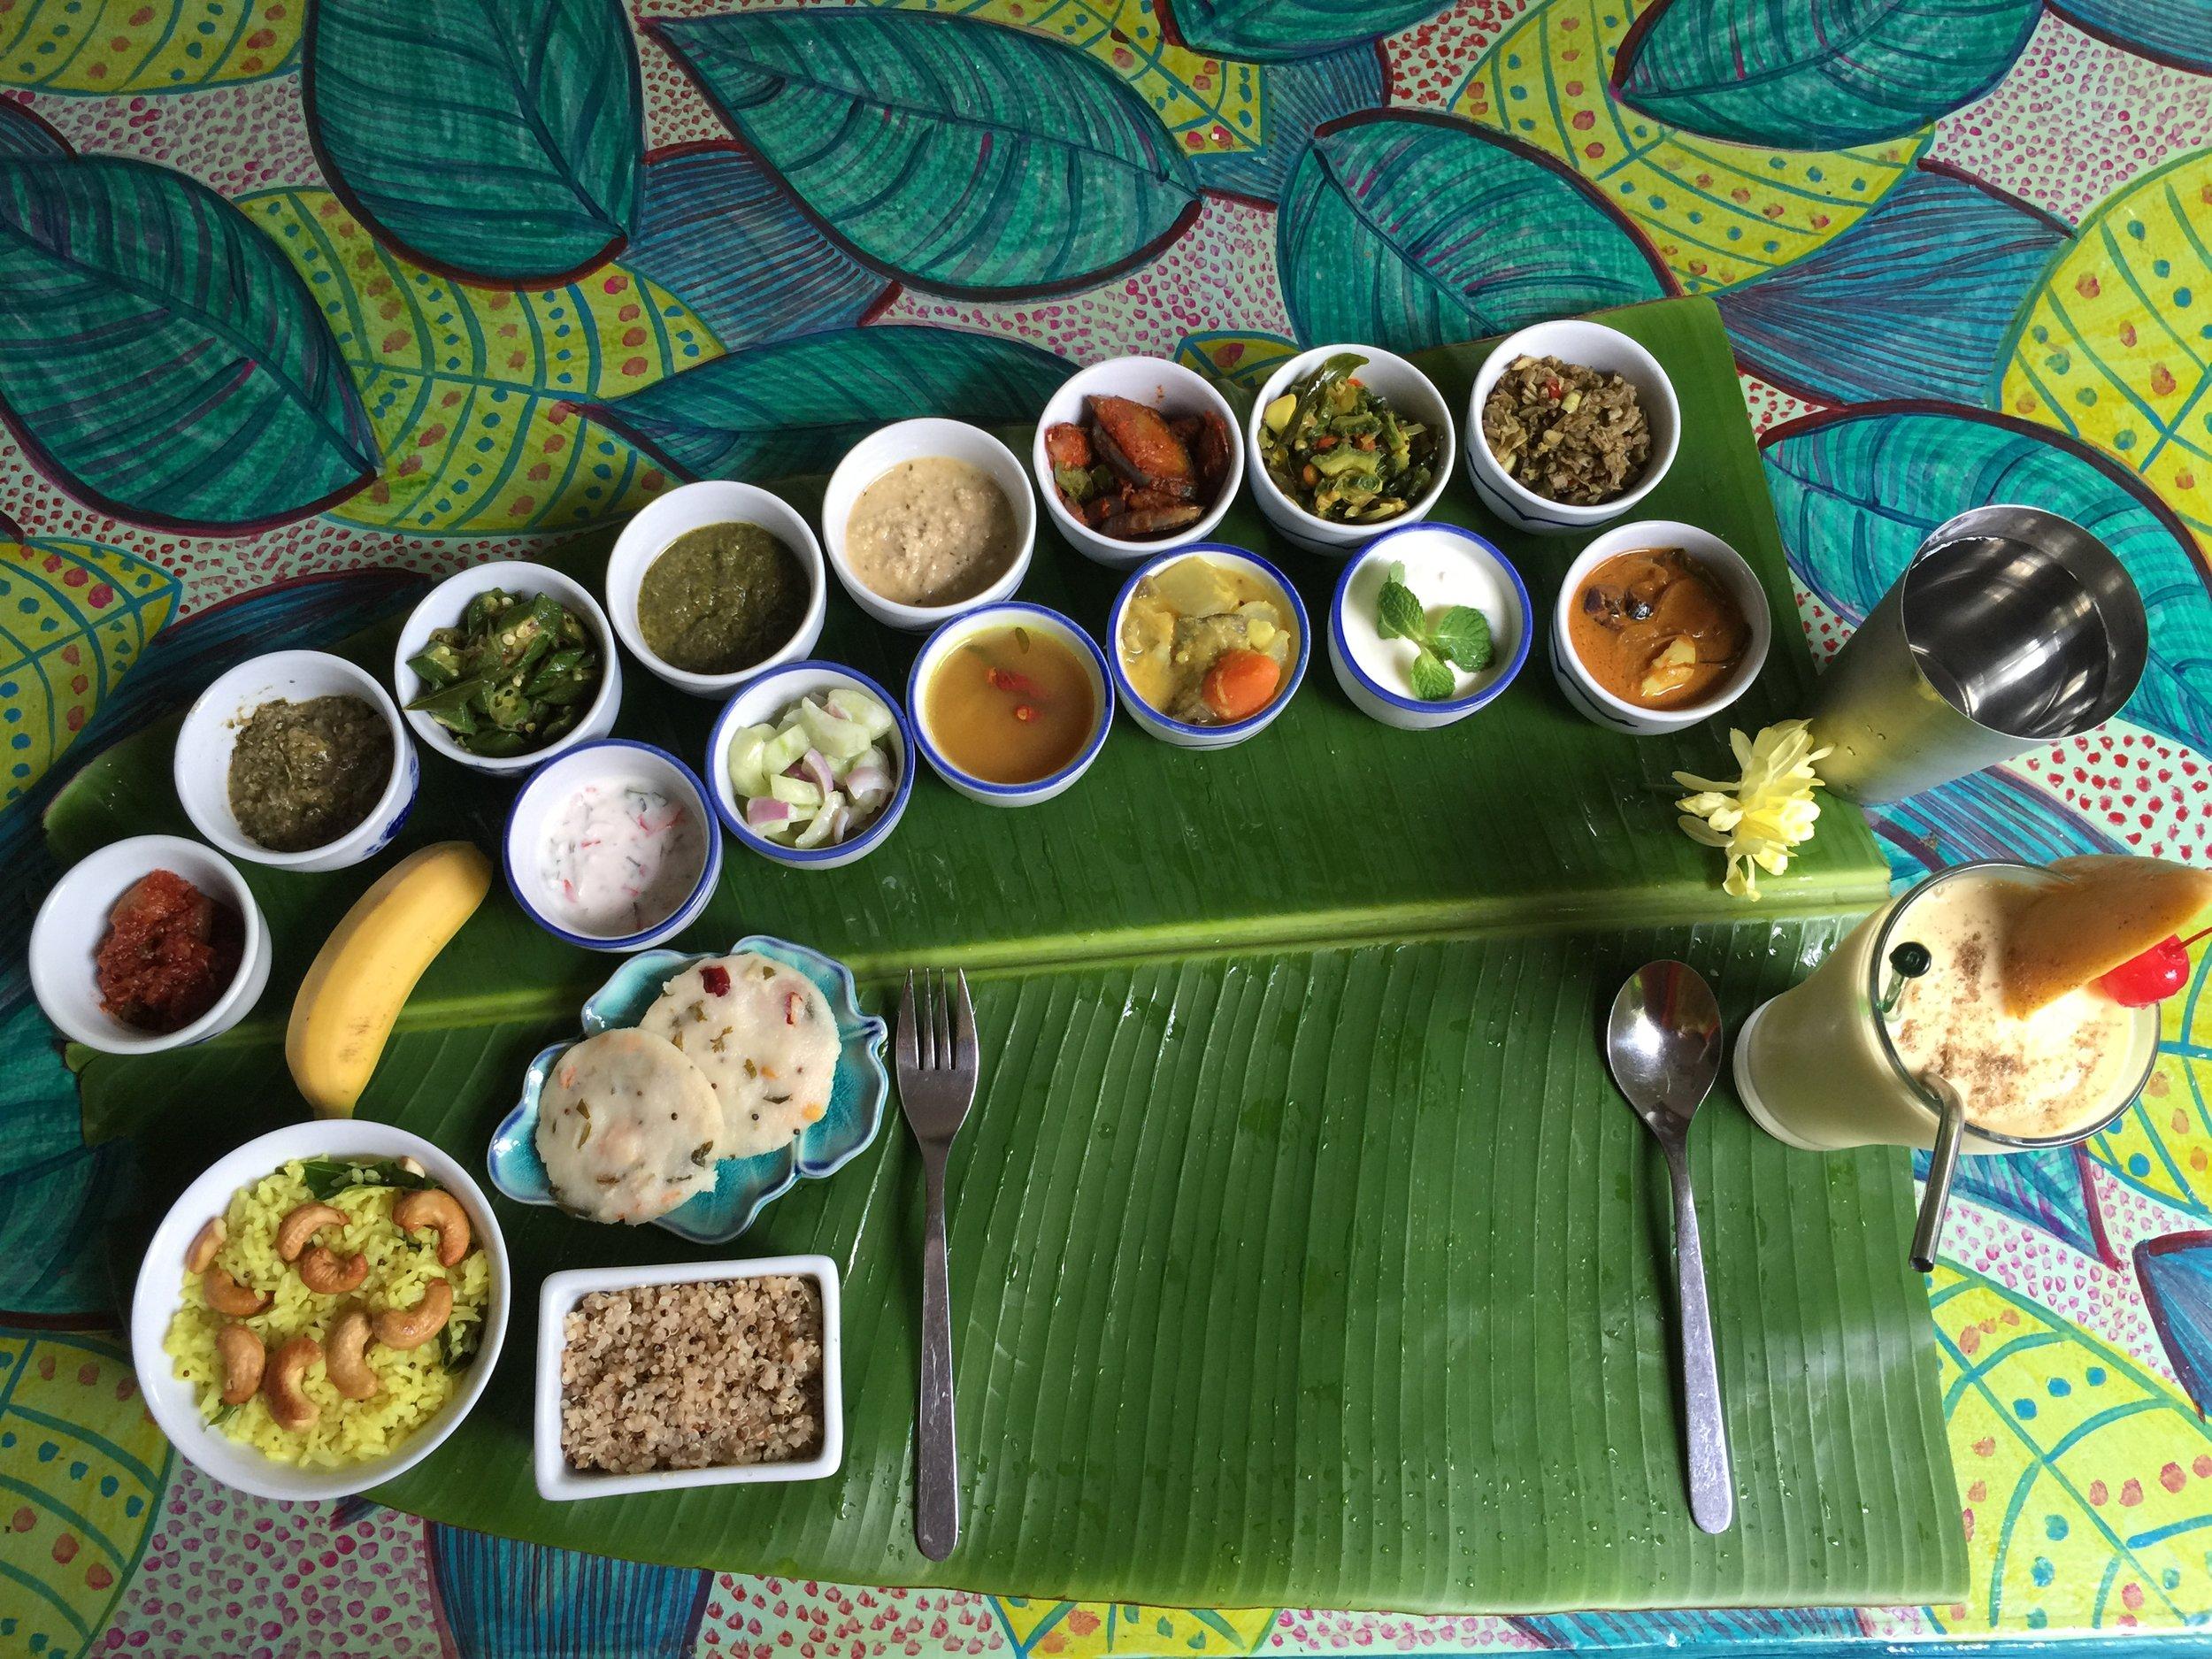 An amazing ayurvedic & vegan lunch.